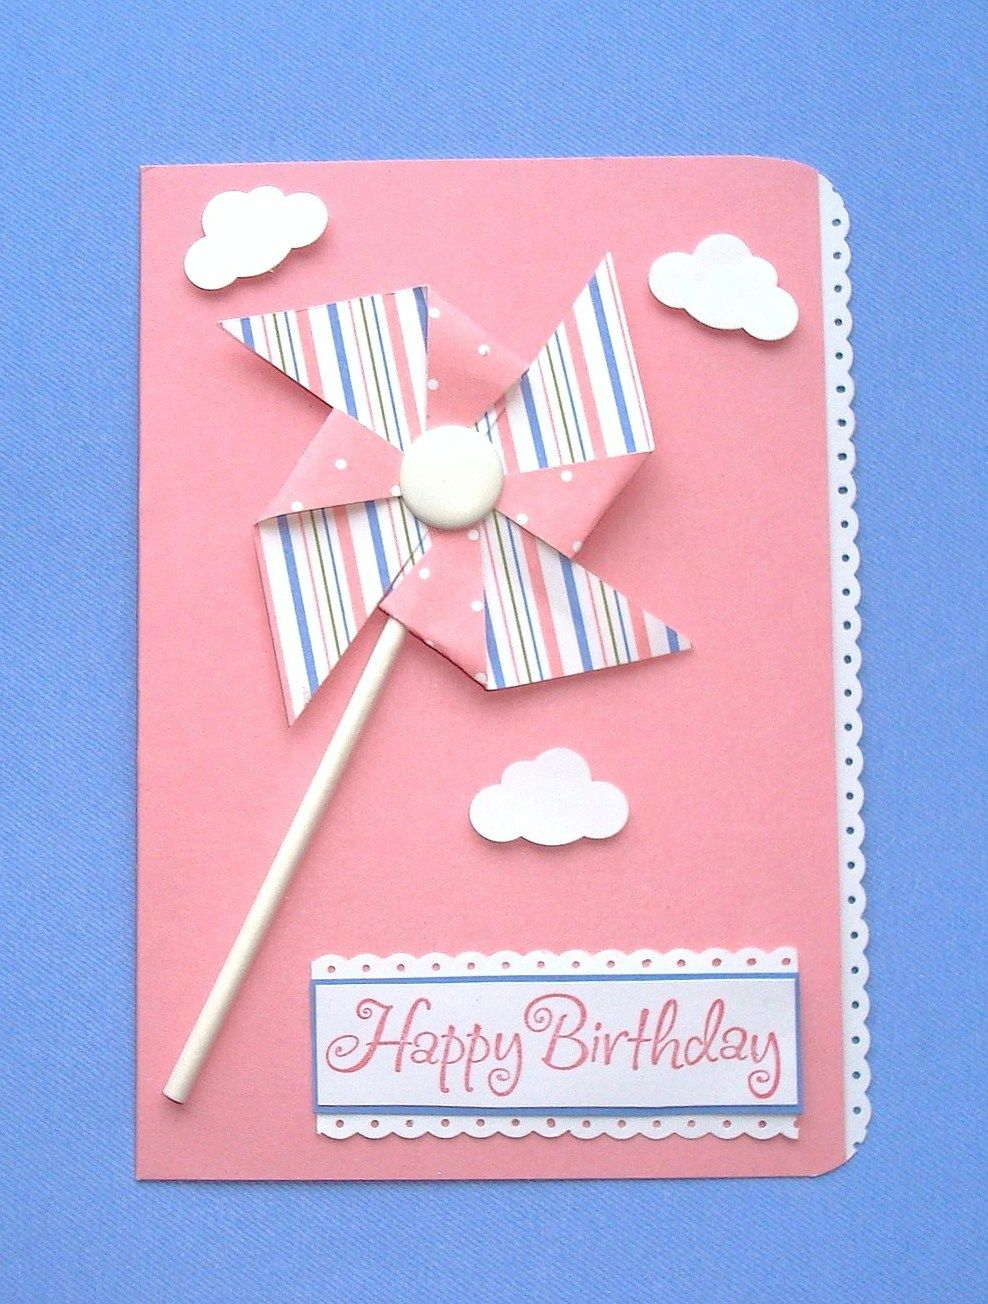 Handmade Cards Pin Handmade Greeting Cards For Teachers 1 On Pinterest Teacher Birthday Card Homemade Birthday Cards Birthday Cards Diy